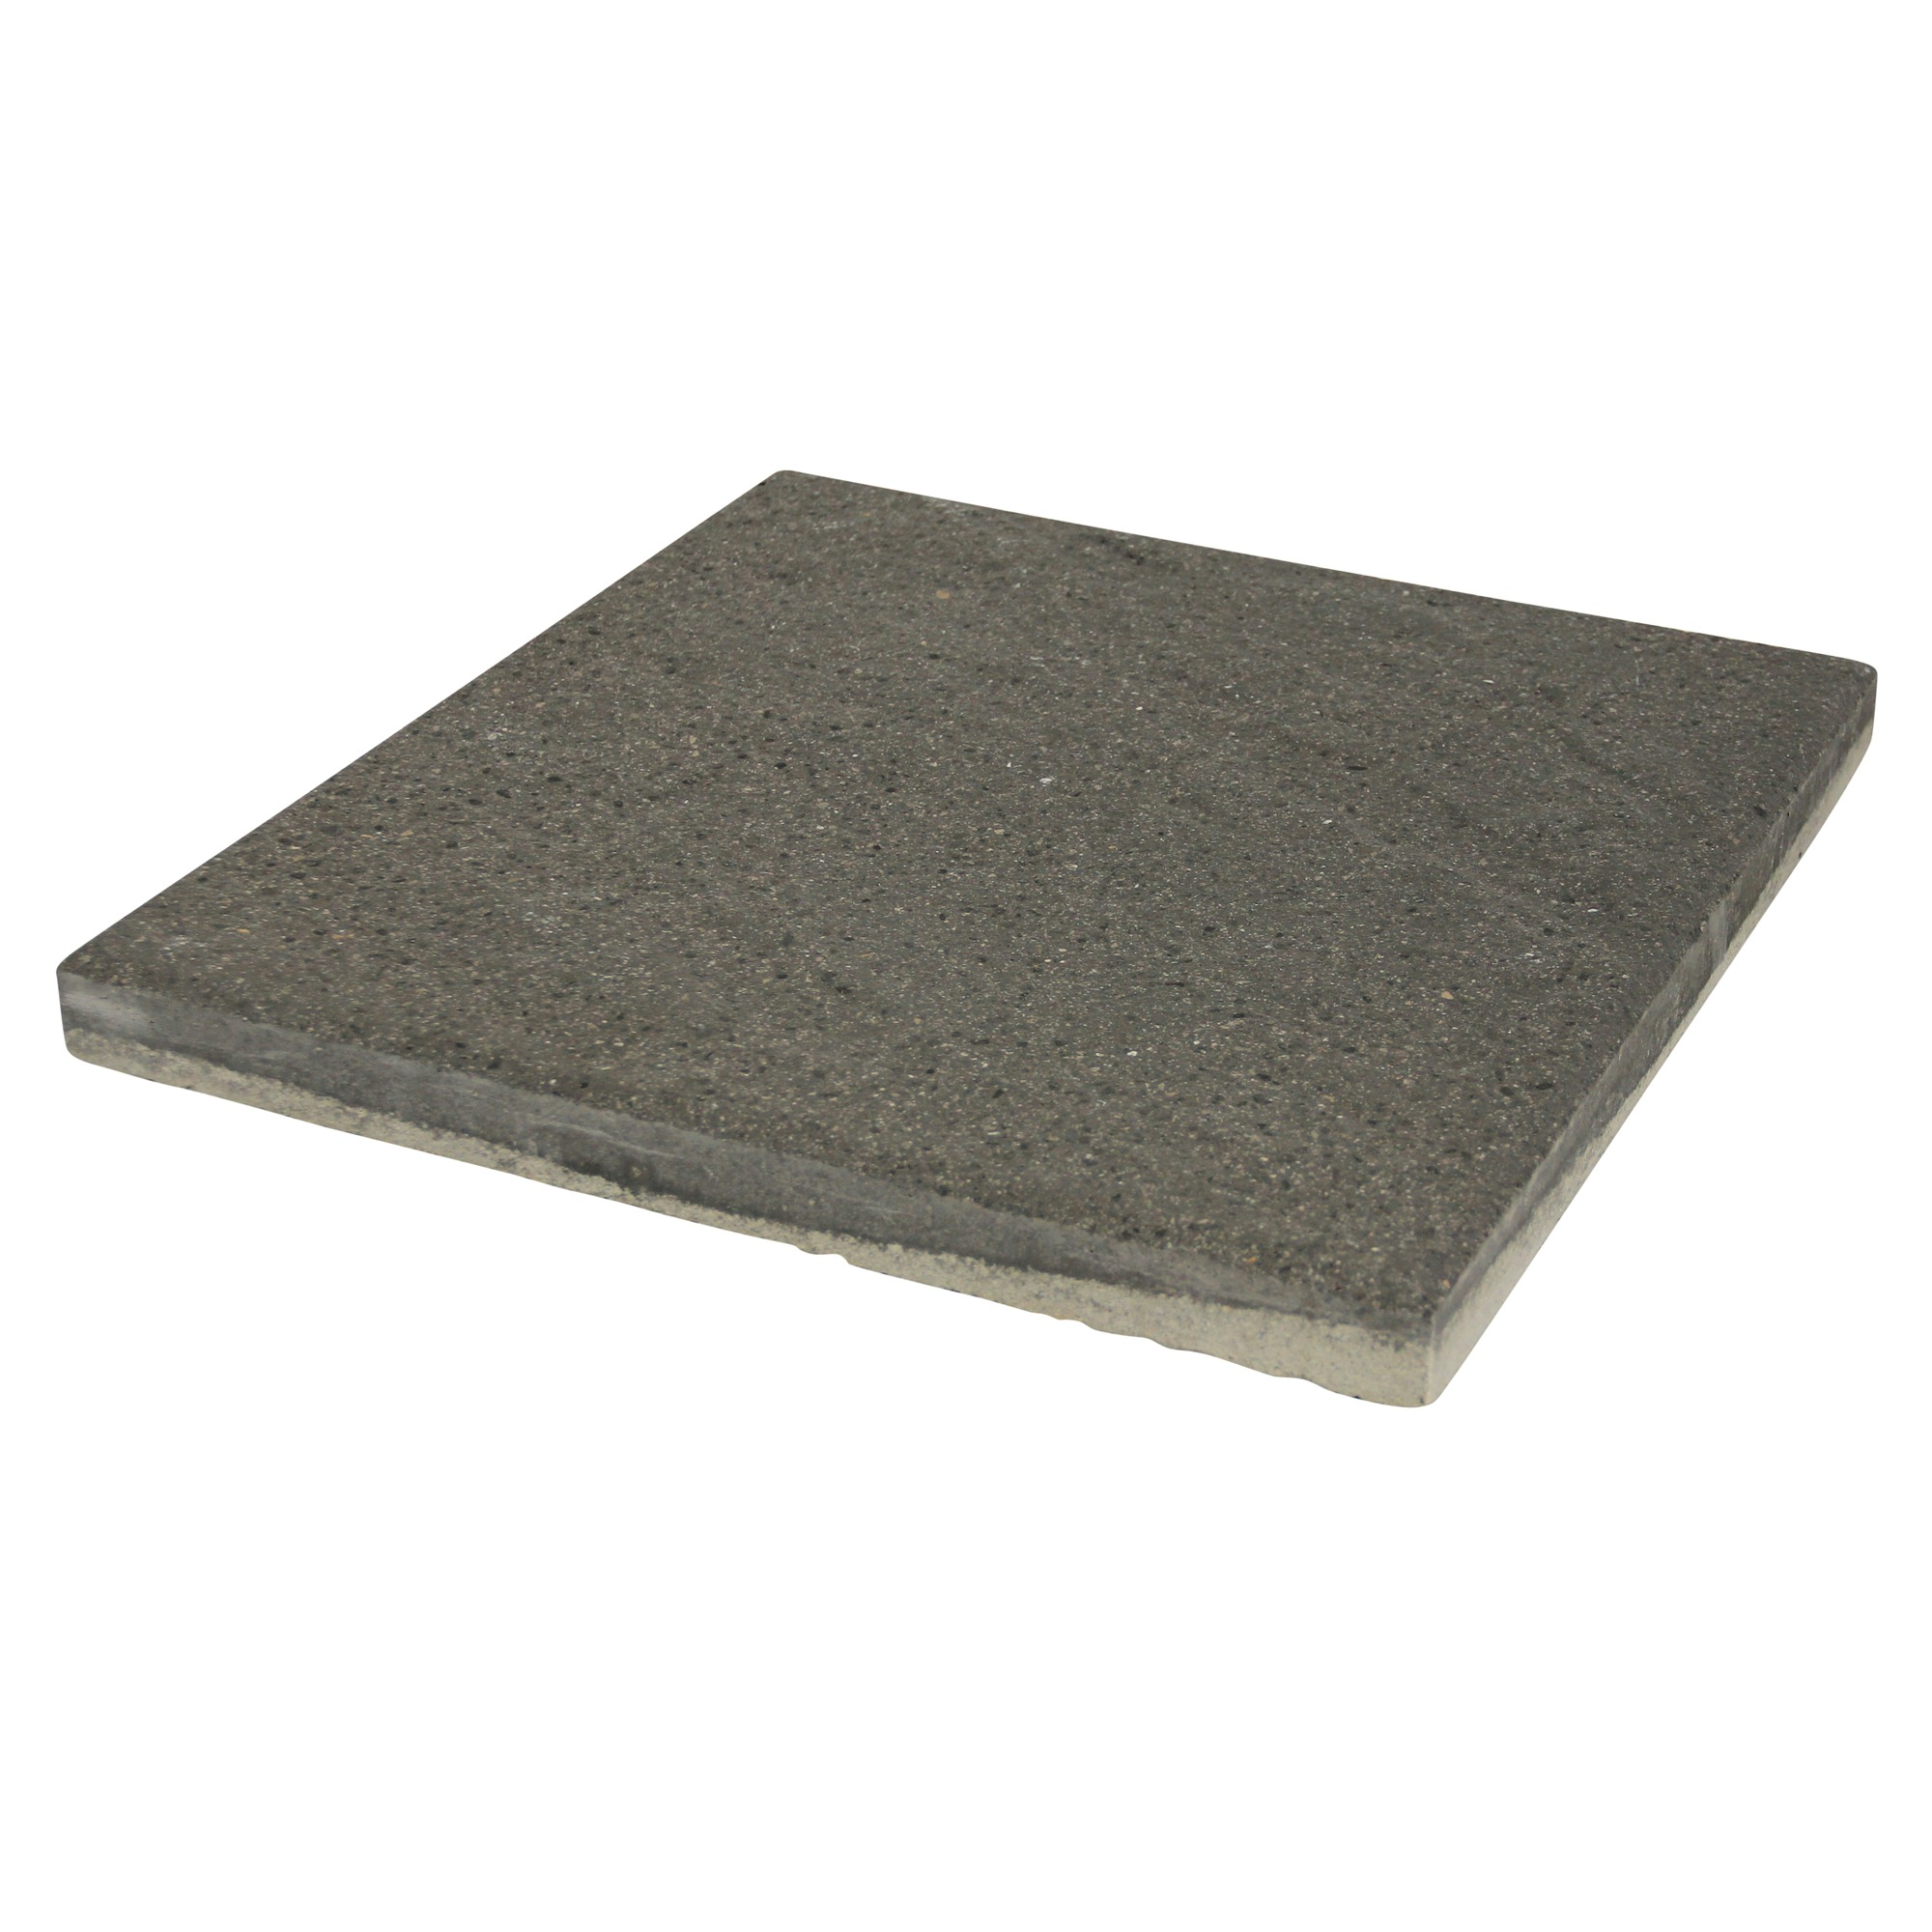 Decor betontegel Brussel antraciet 40 x 40cm 0,16m²